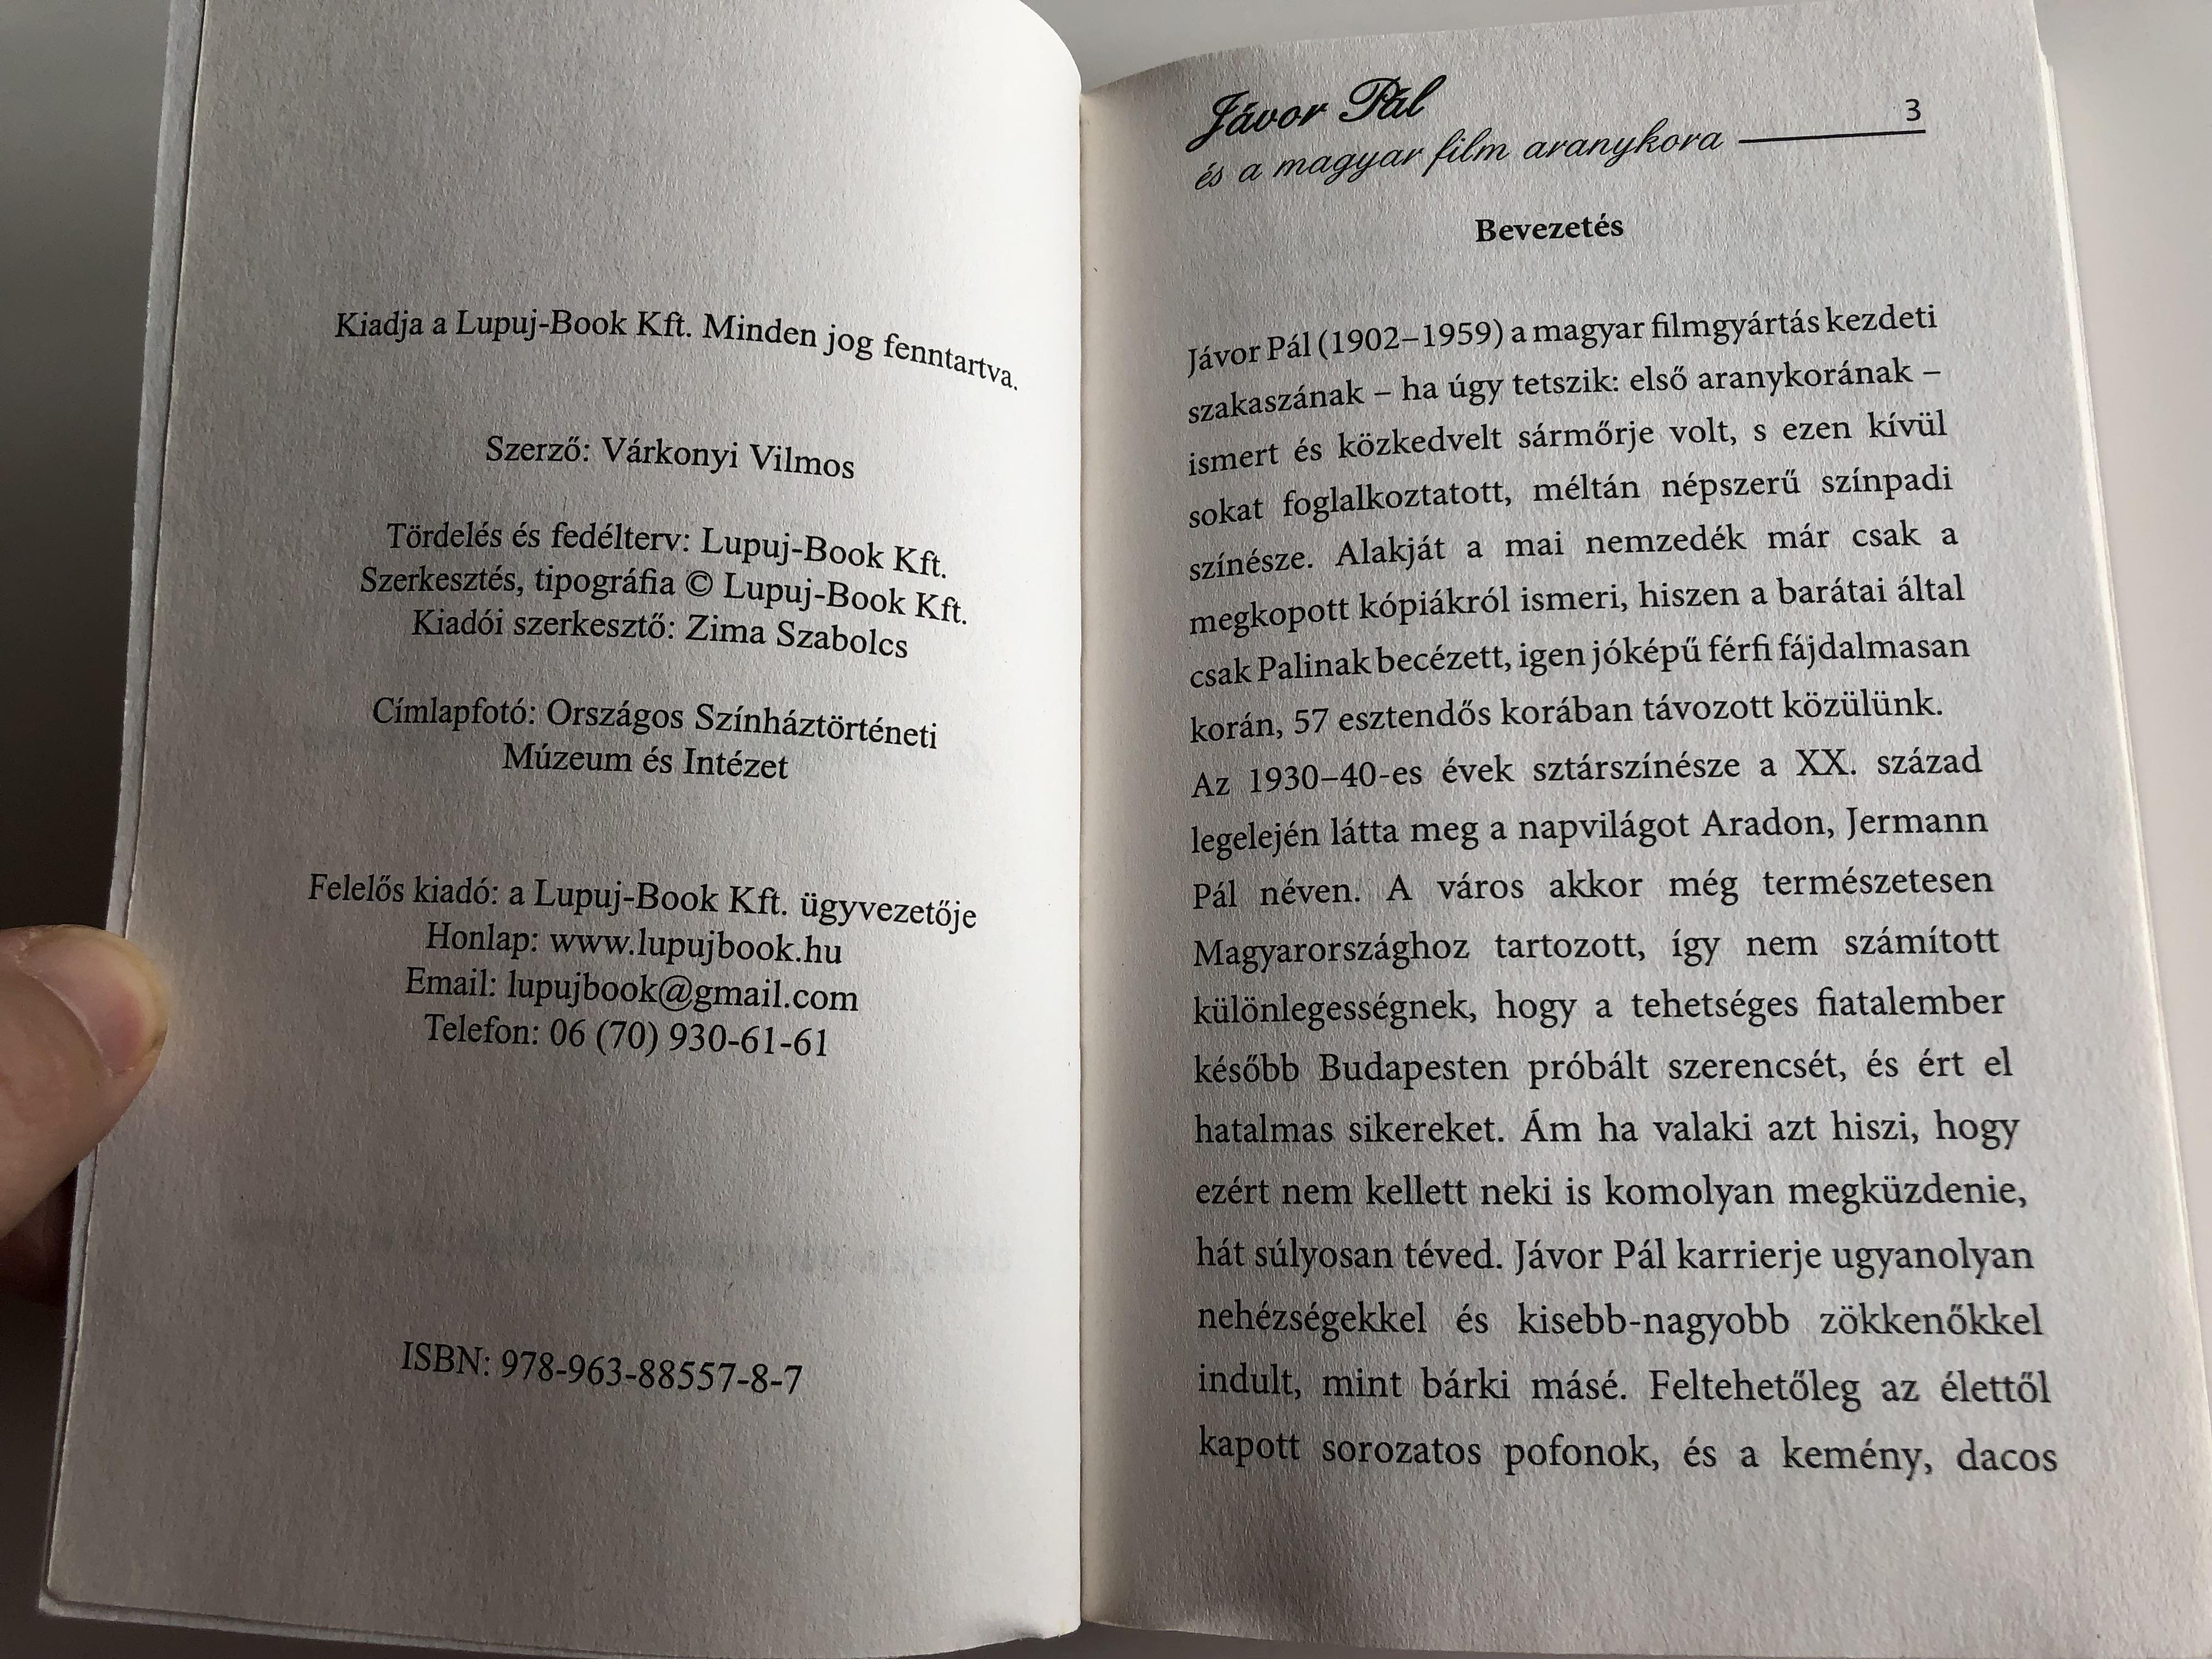 j-vor-p-l-s-a-magyar-film-aranykora-by-v-rkonyi-vilmos-letrajz-anekdot-k-p-lyat-rsak-sl-gerek-3.jpg